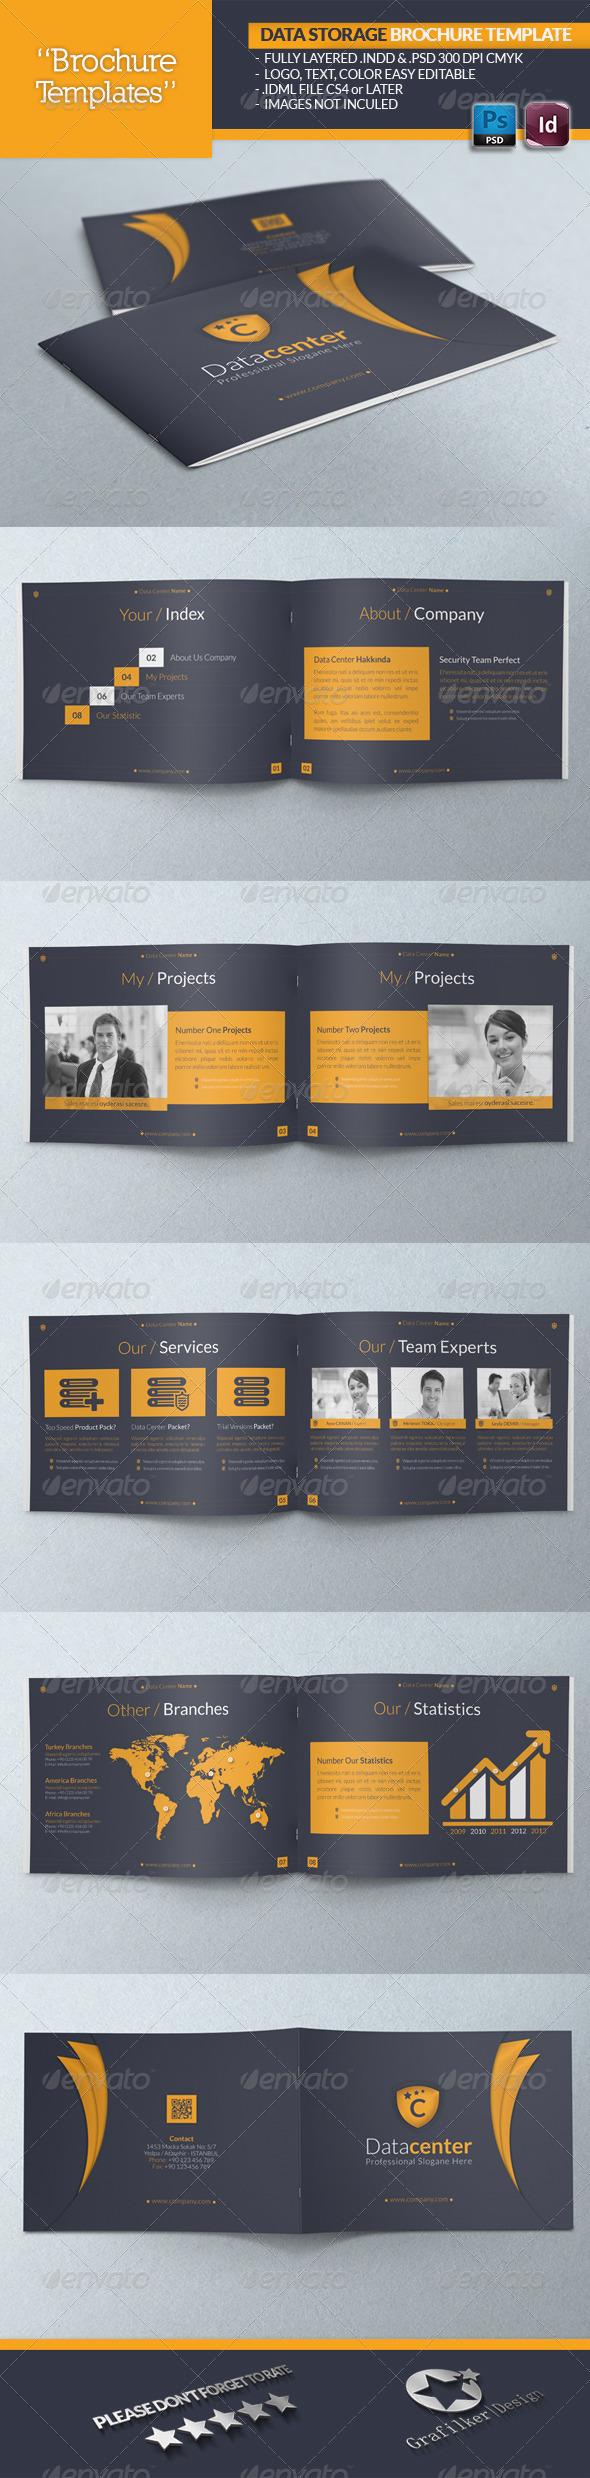 GraphicRiver Data Storage Brochure Template 4778220